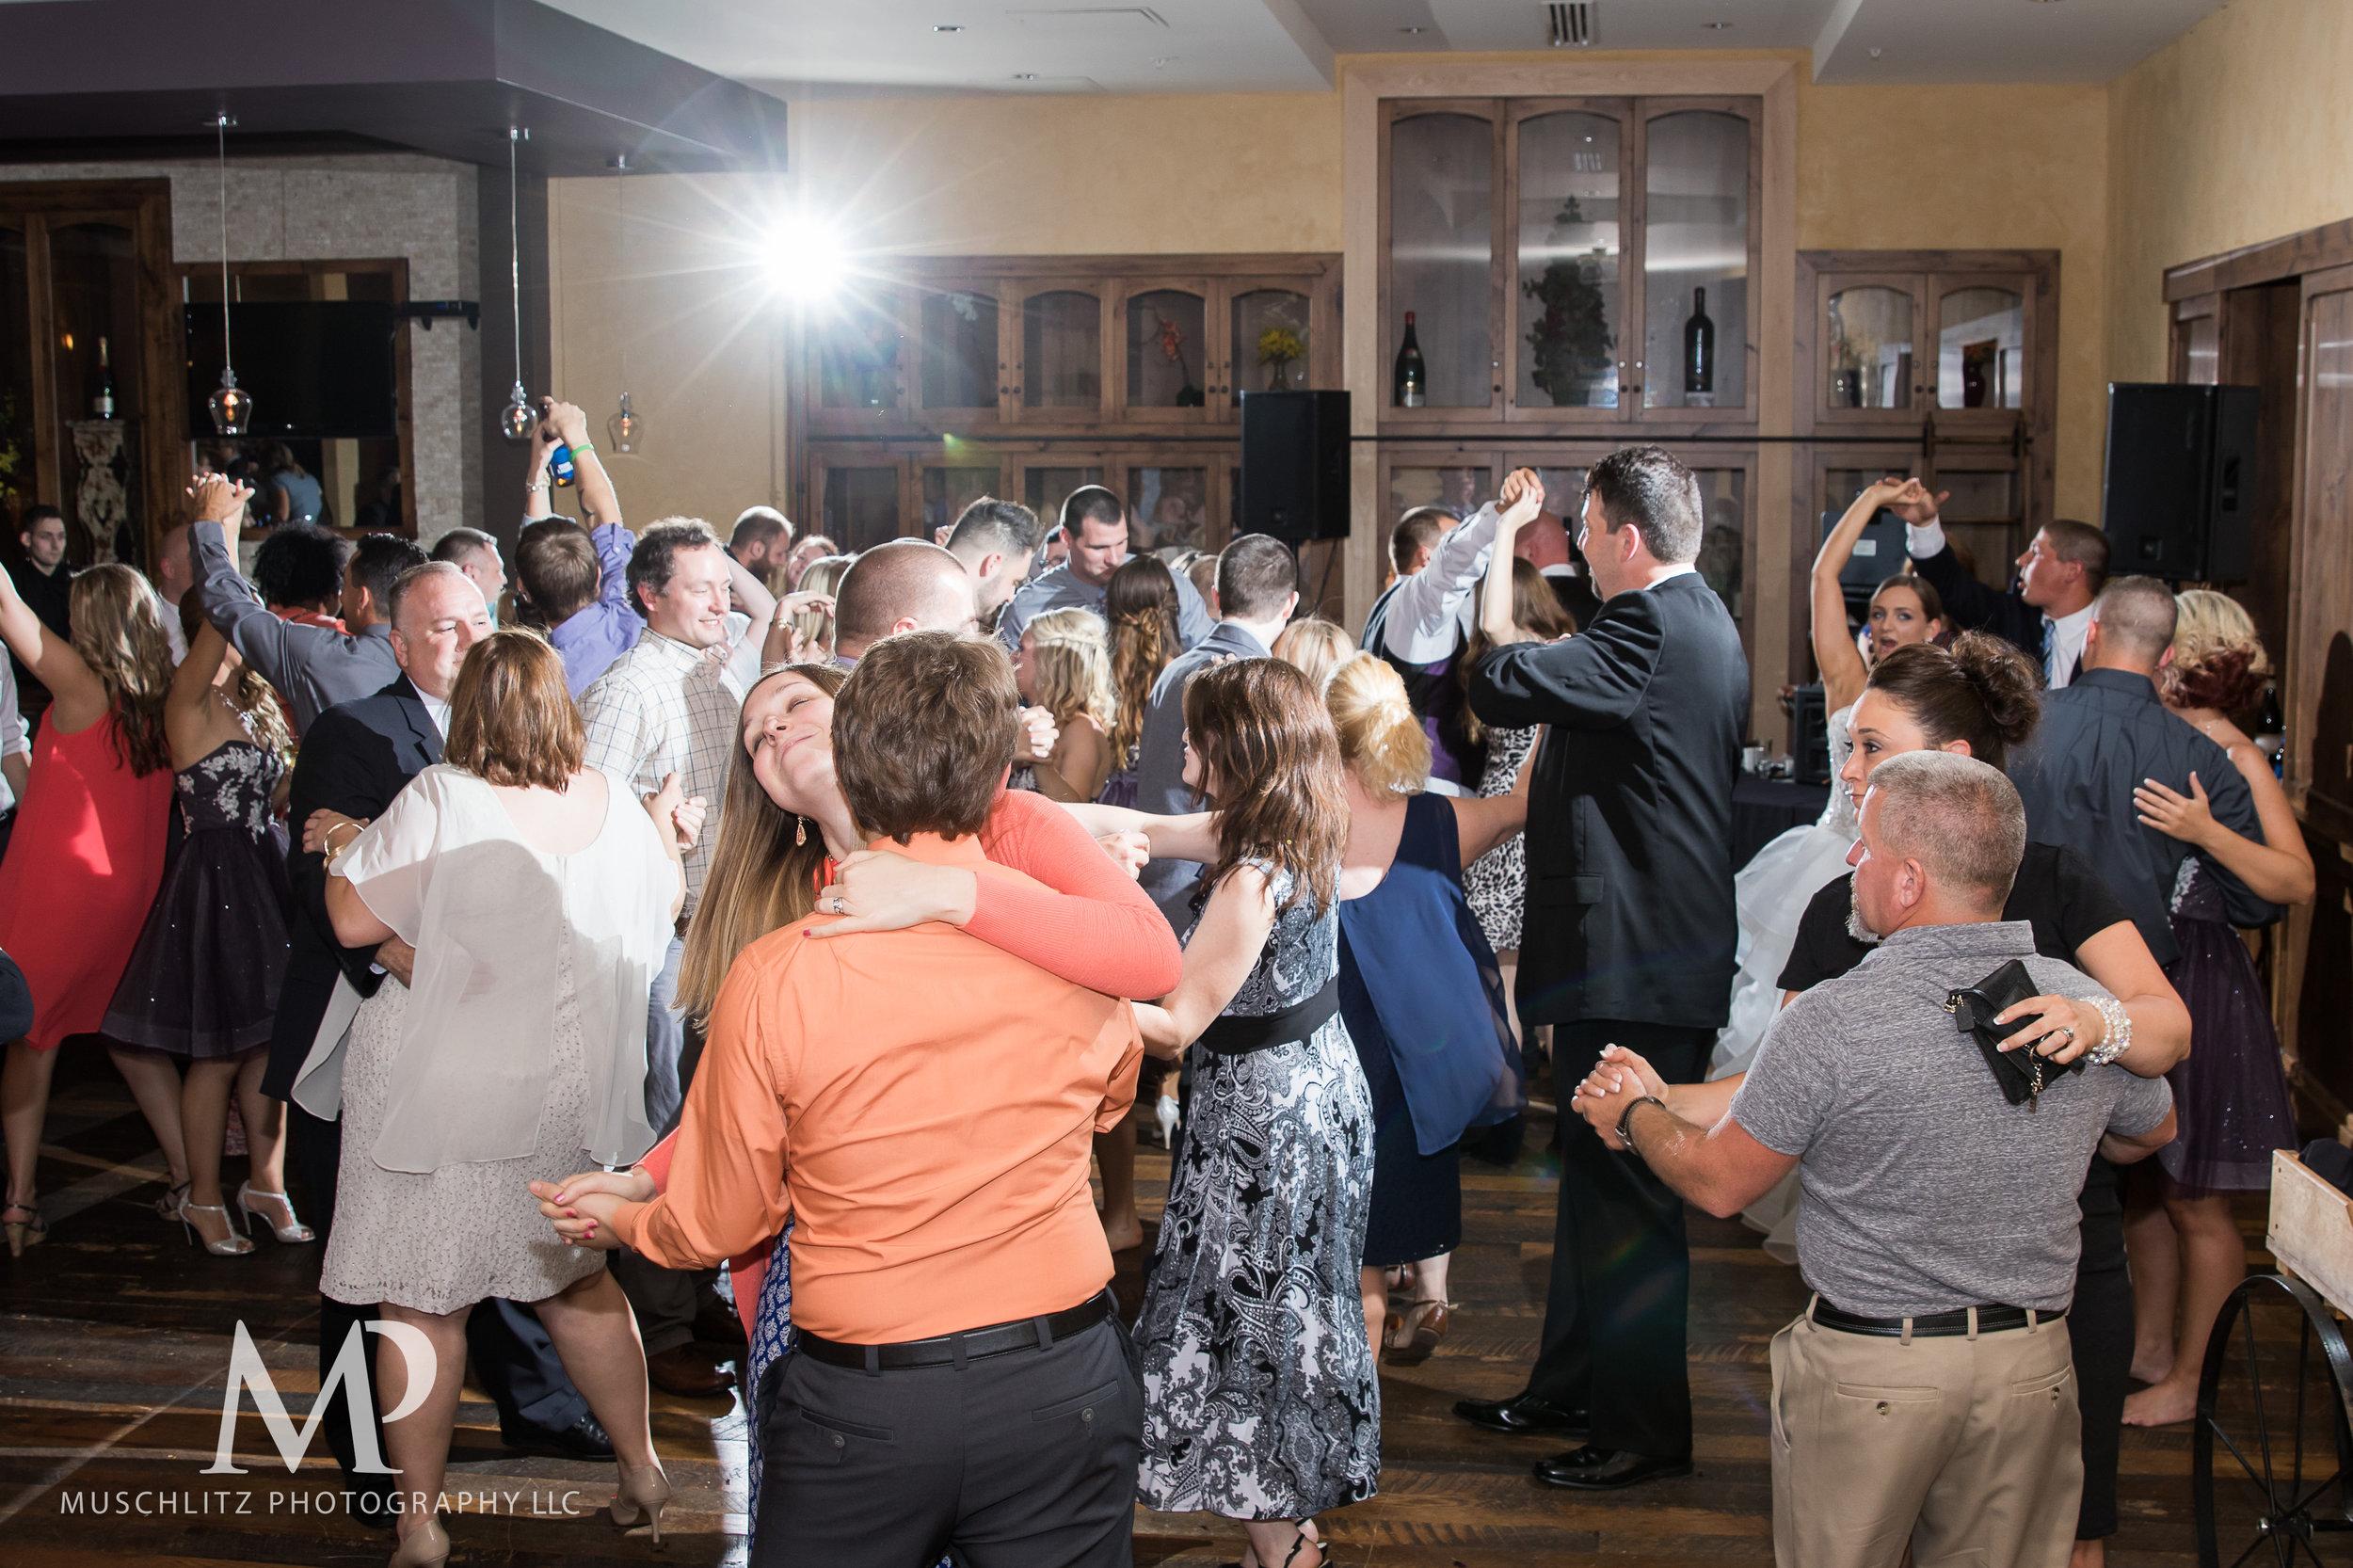 club-at-corazon-wedding-ceremony-reception-columbus-dublin-ohio-ohio-university-theme-087.JPG